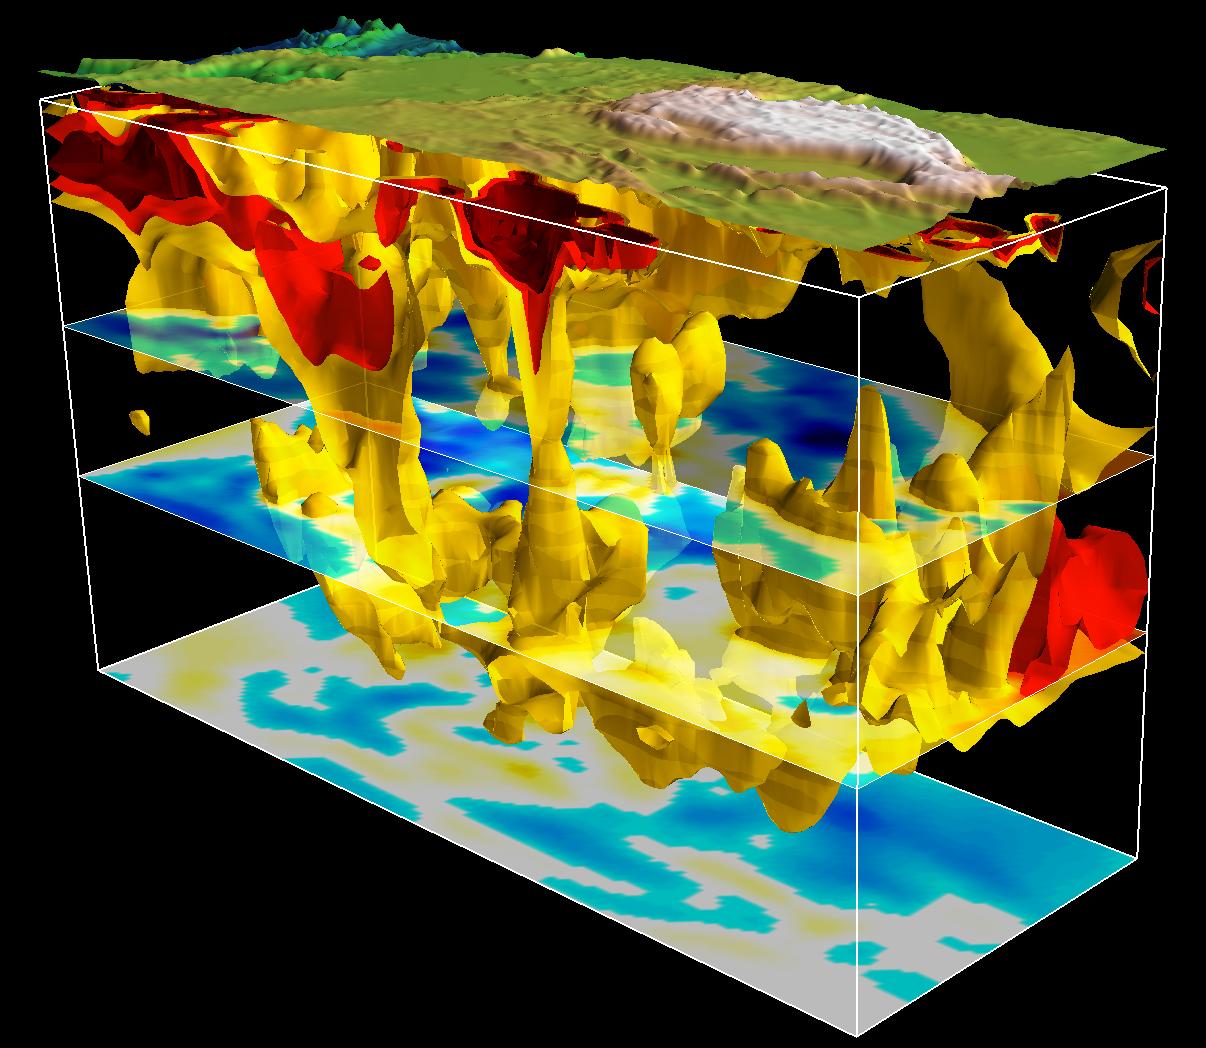 https://www.tacc.utexas.edu/-/earthquakes-reveal-deep-secrets-beneath-east-asia